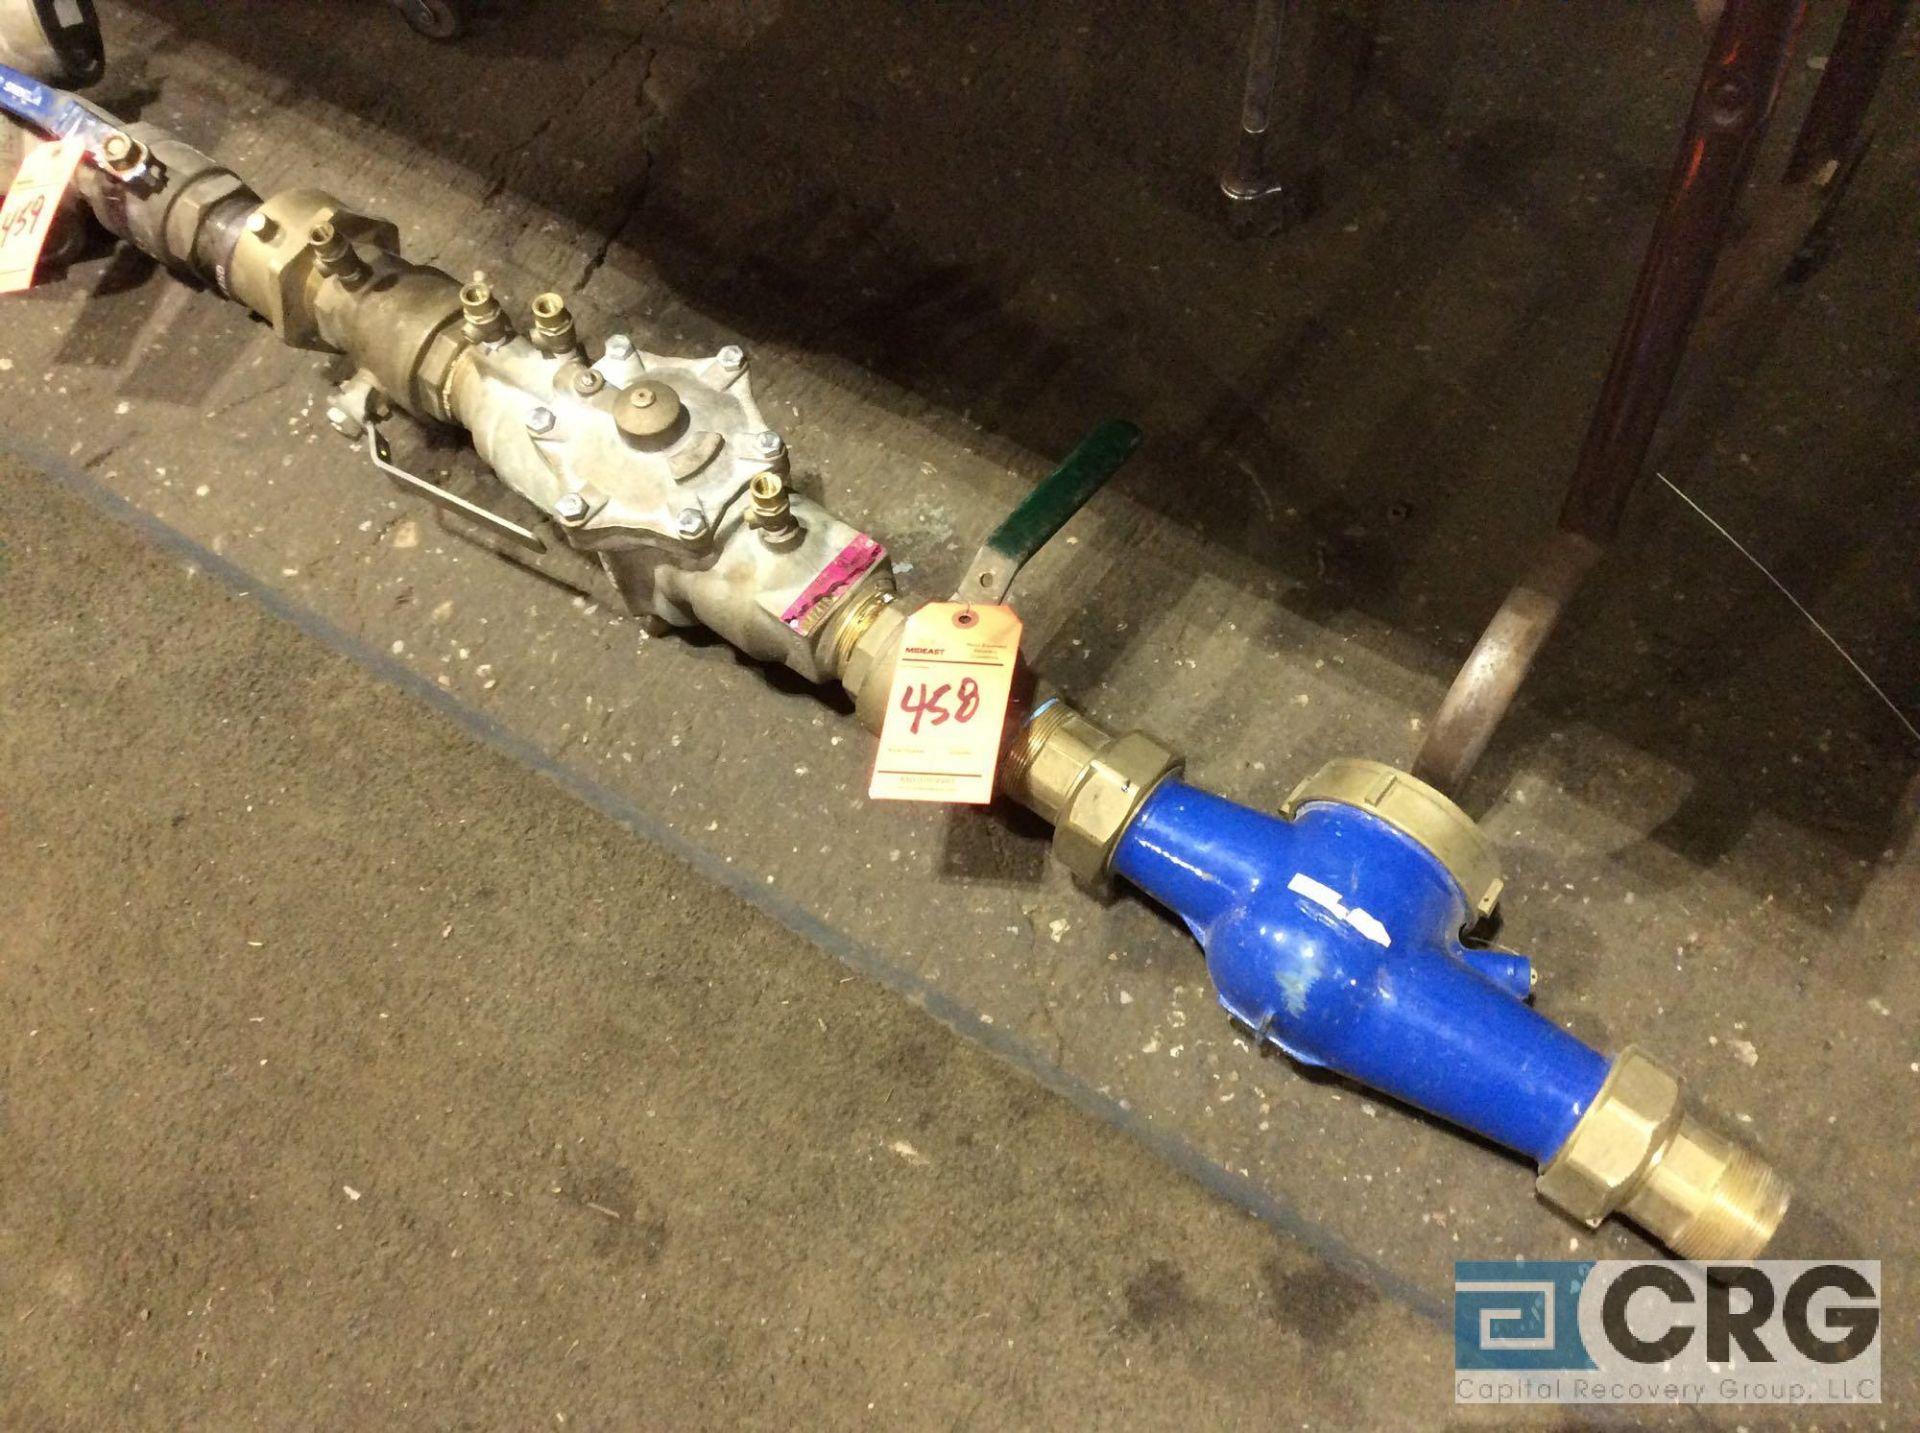 Lot 458 - Watts 2 inch back flow preventer